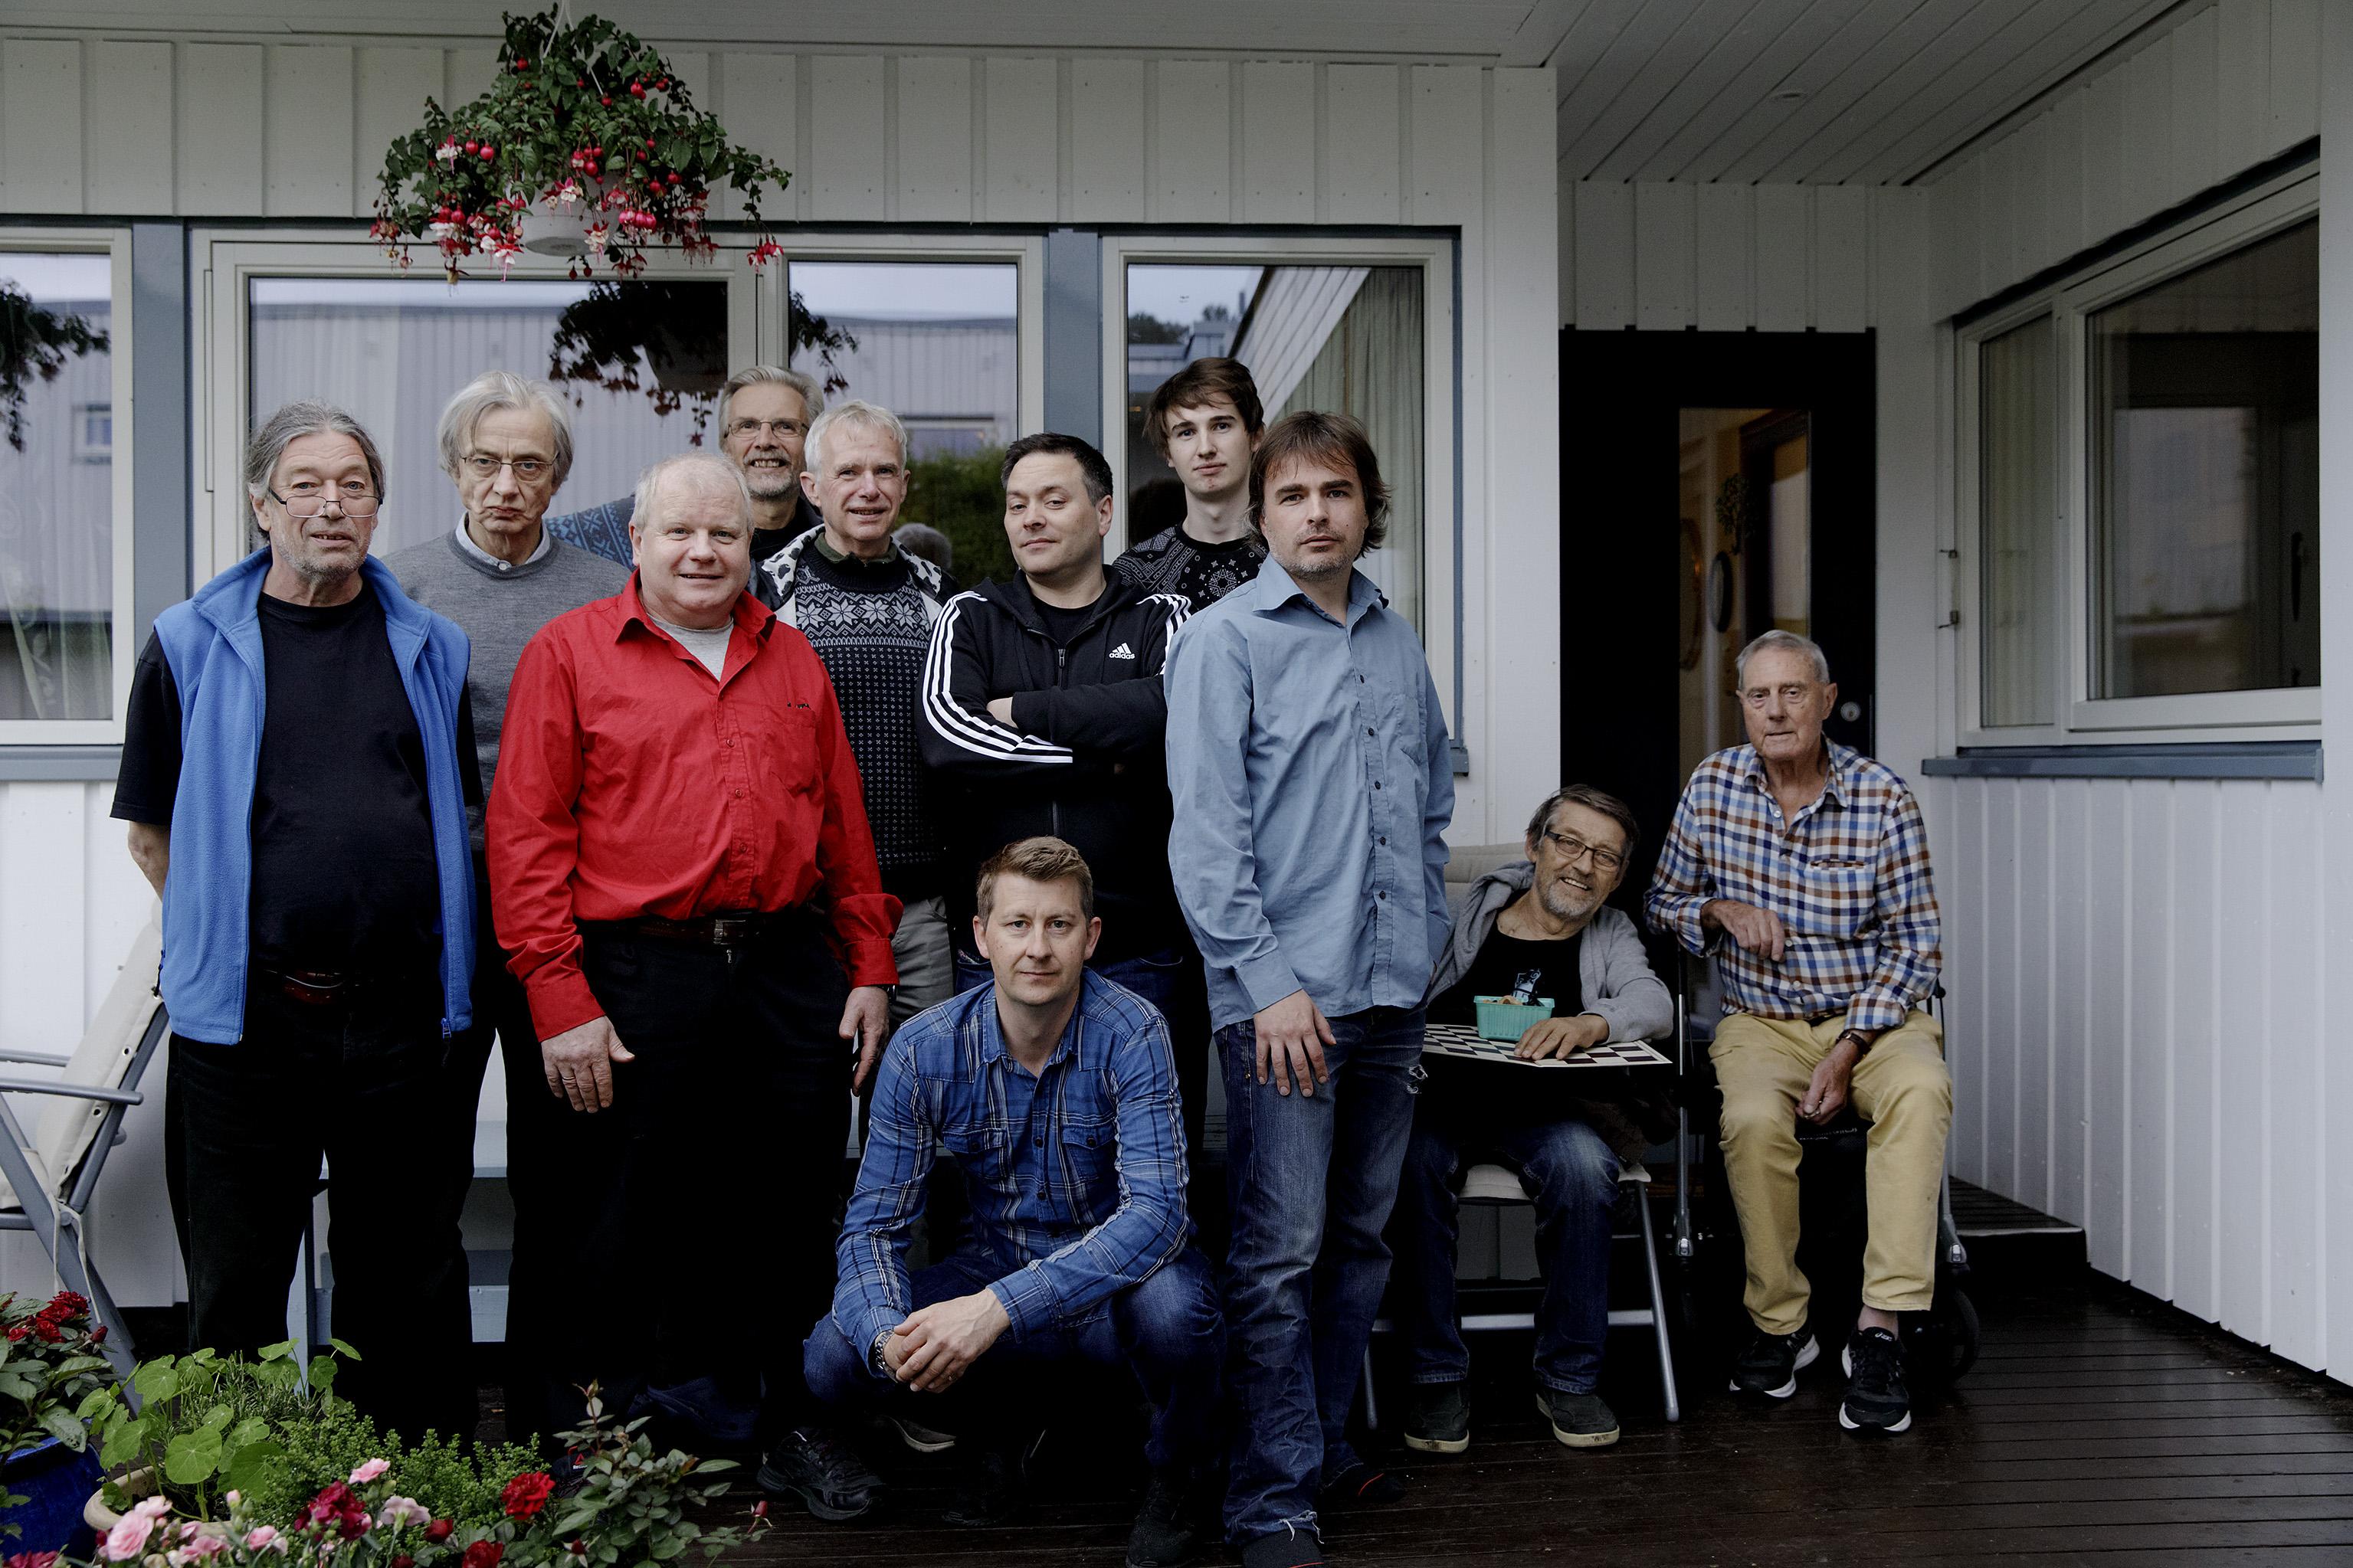 Sommersjakk 2017 FOTO: Amundsen, Paul S.